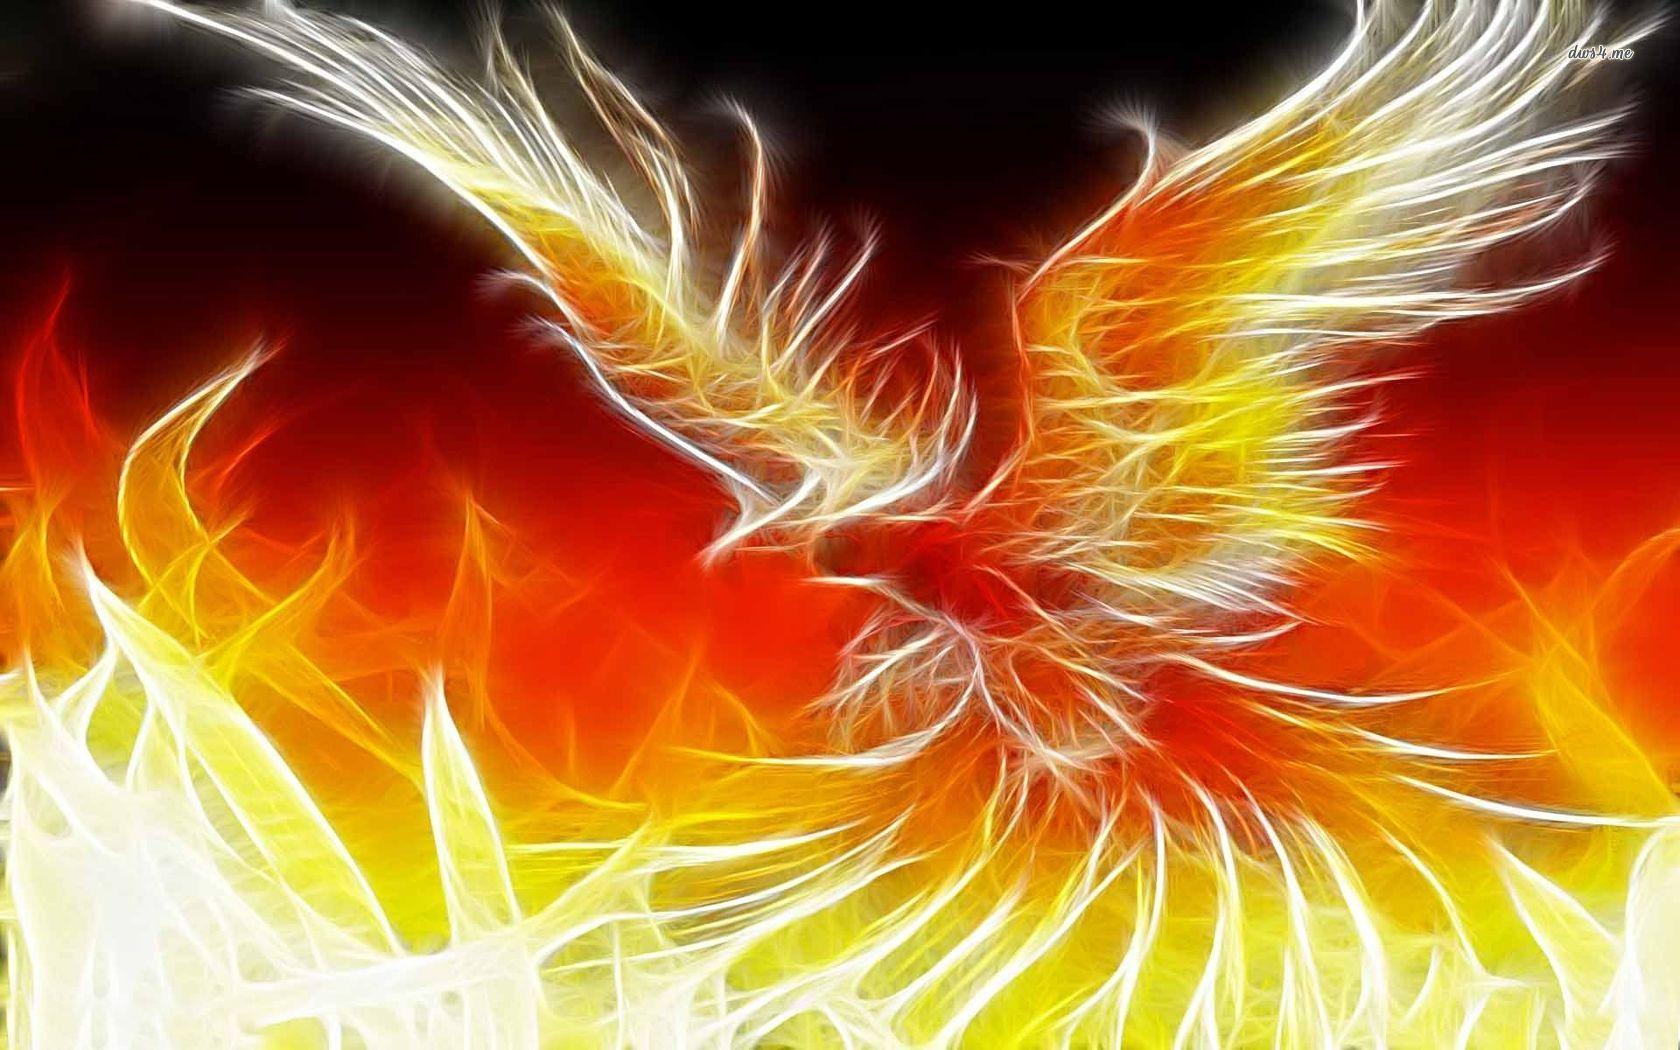 Phoenix Bird 34 Desktop Wallpaper   Hivewallpapercom 1680x1050